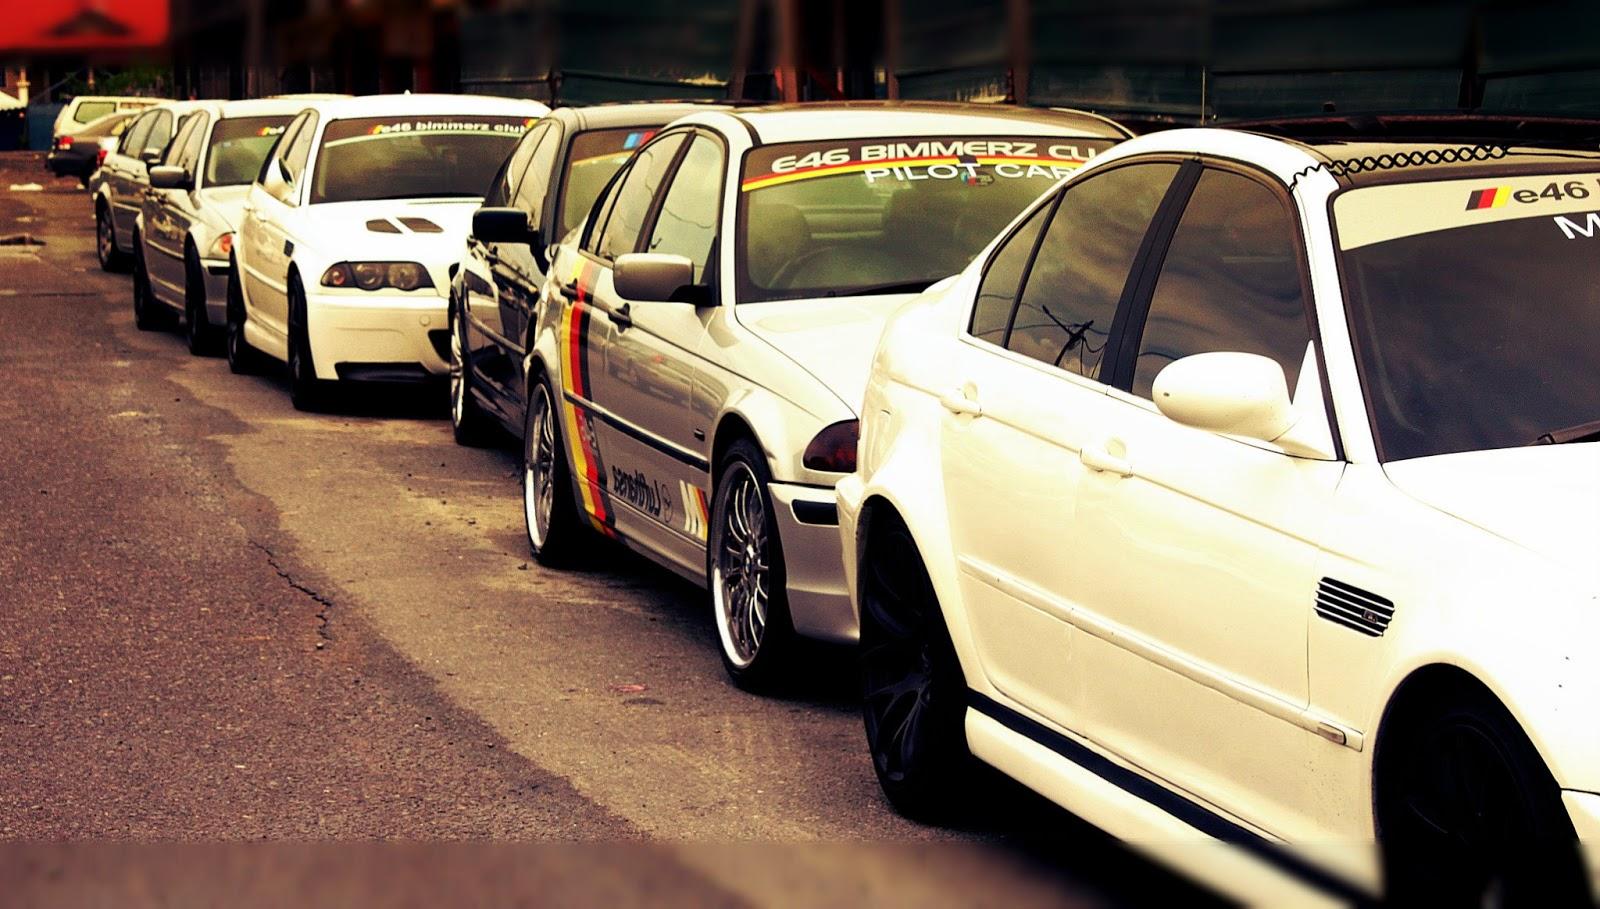 Jerantut Malaysia  city images : KONVOI JERANTUT E46 CLUB BIMMERZ MALAYSIA